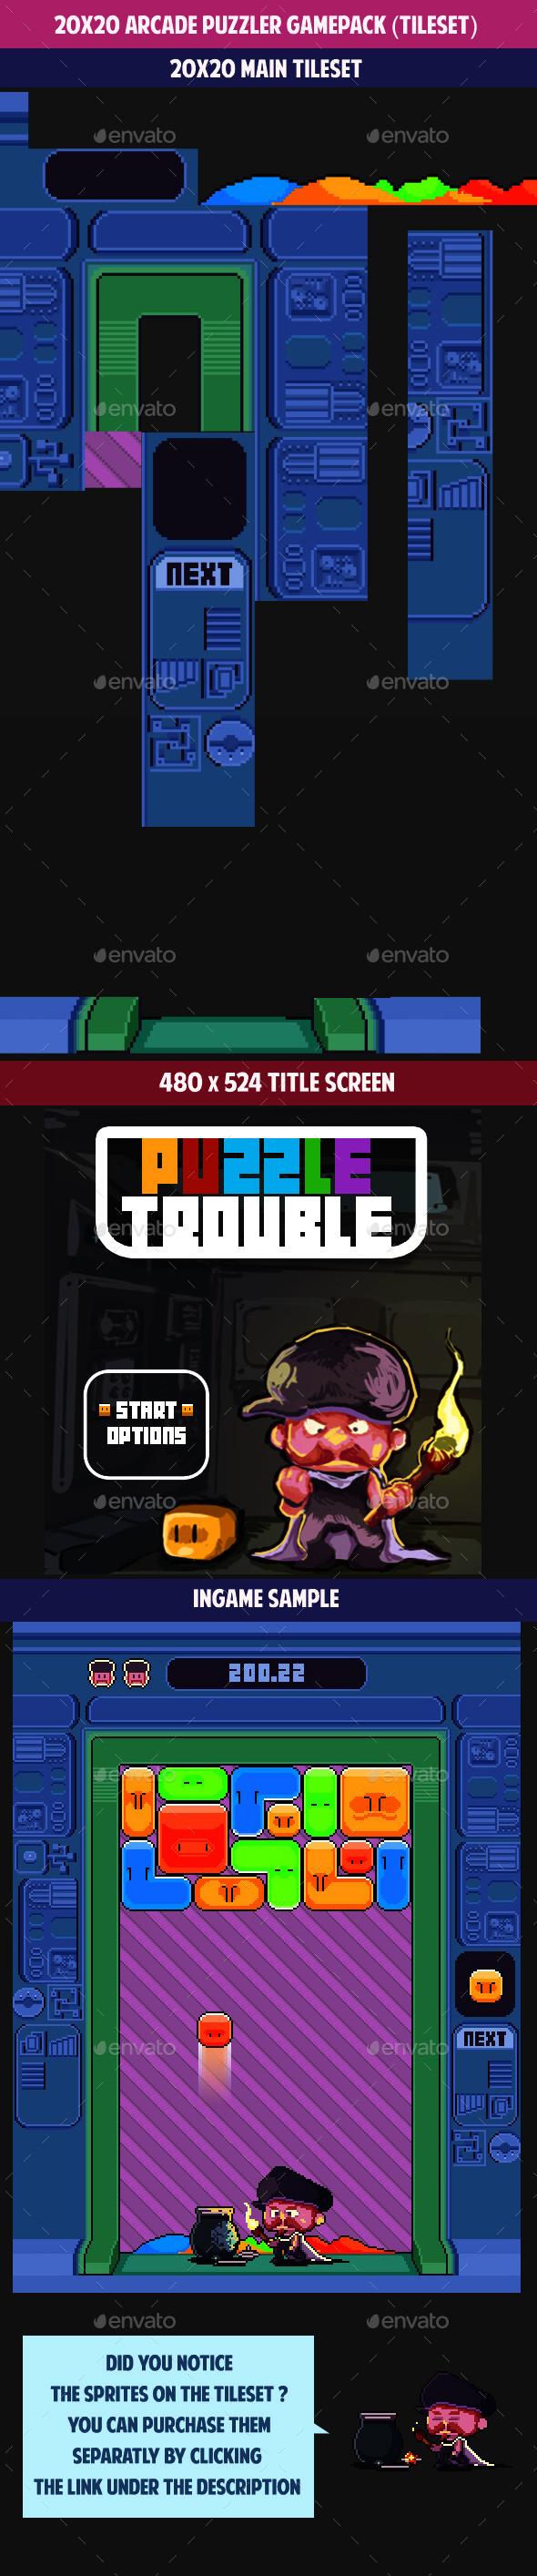 20x20 Arcade PUZZLER gamepack (tileset) (Tilesets)